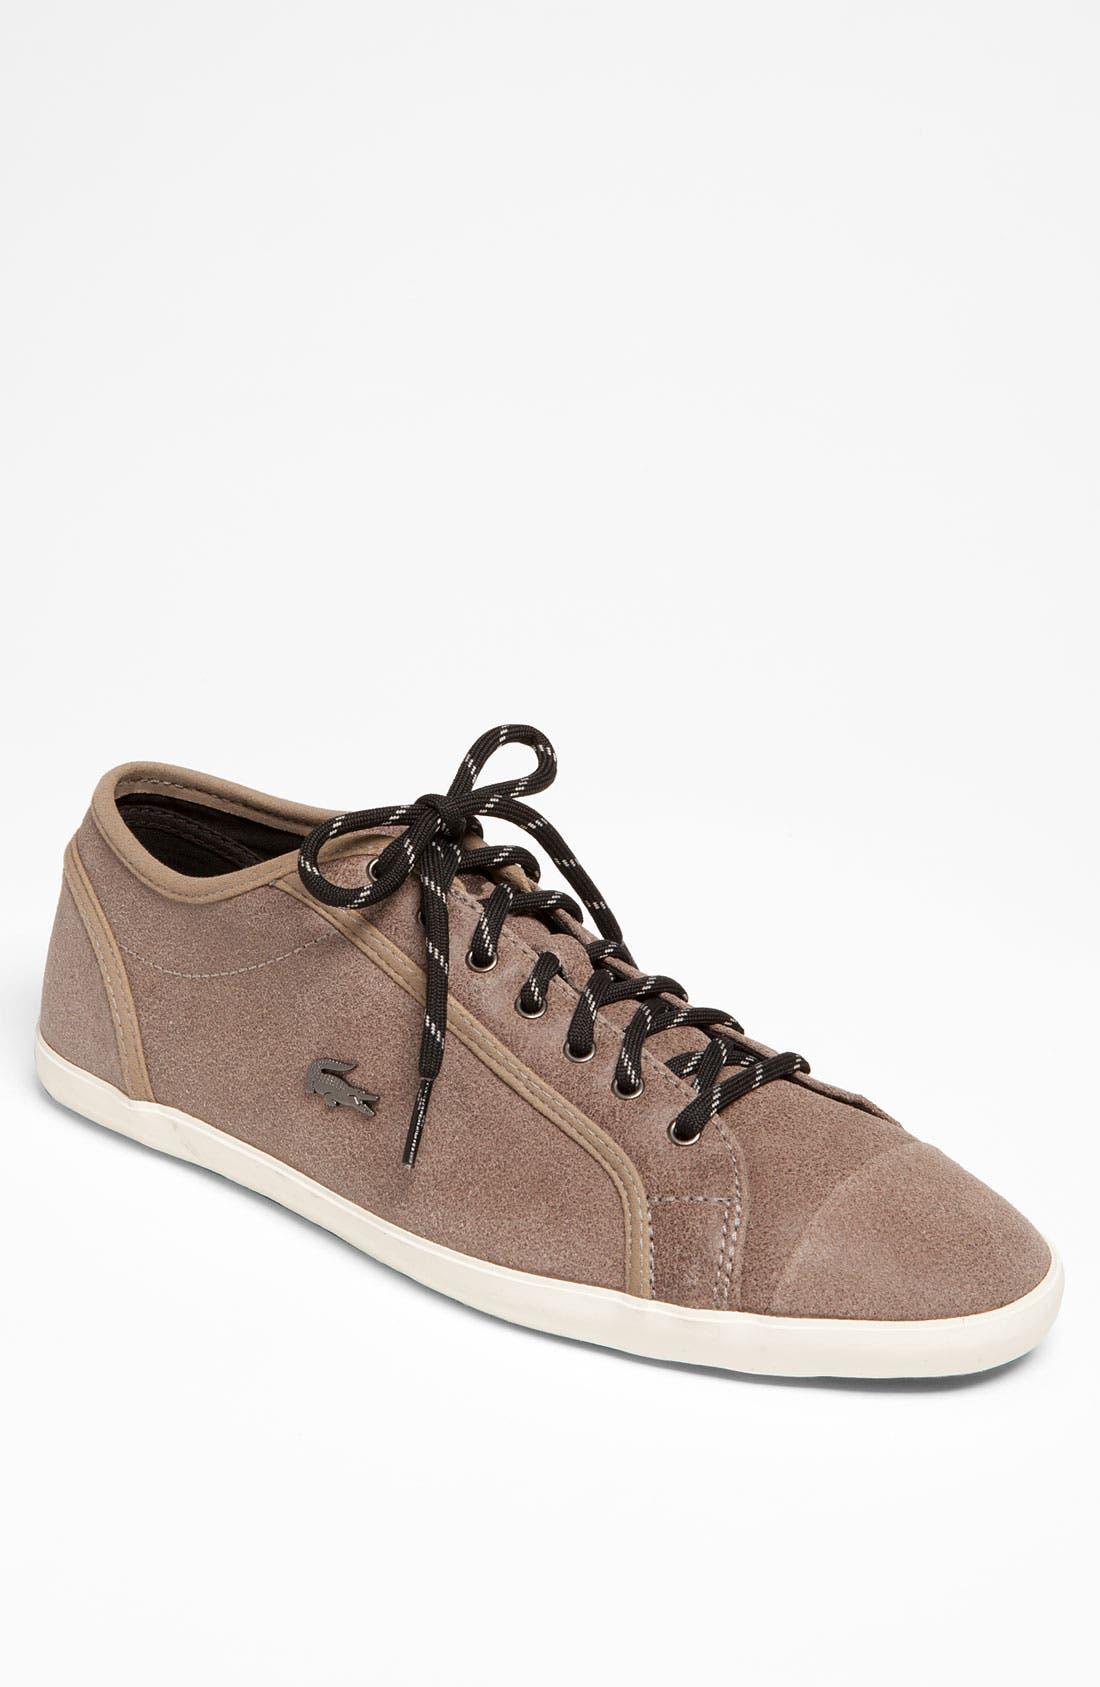 Main Image - Lacoste 'Berber 6' Sneaker